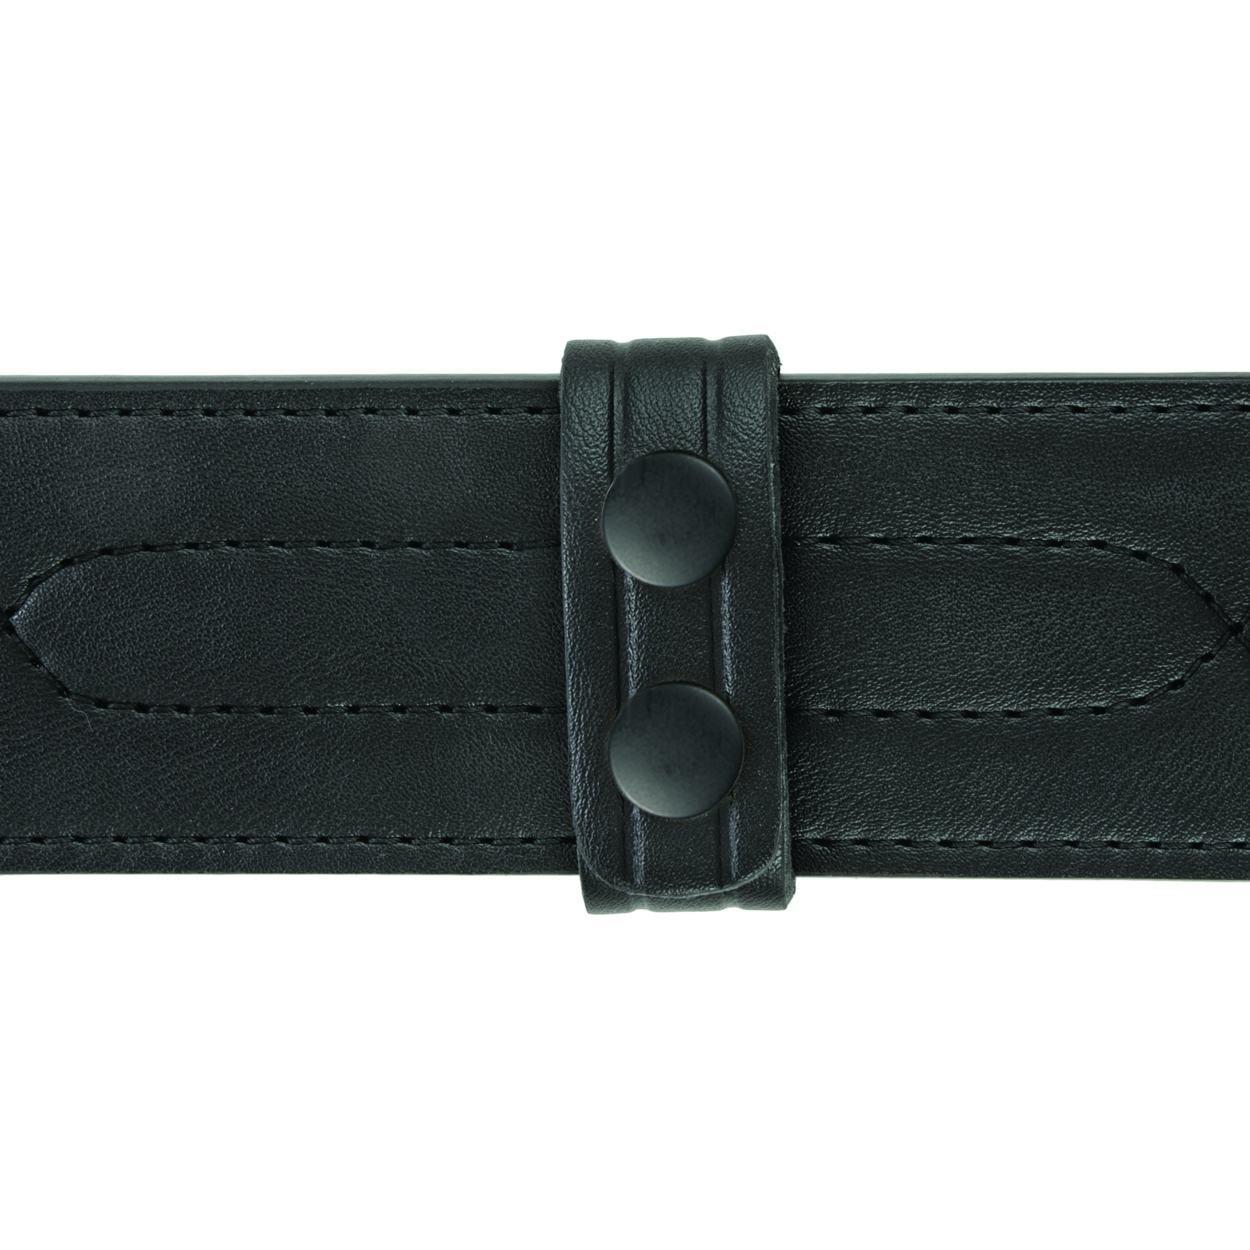 "Belt Keepers, 2 1/4"" Belt, 4 Pack, Standard, AirTek, Smooth, Black Snaps"